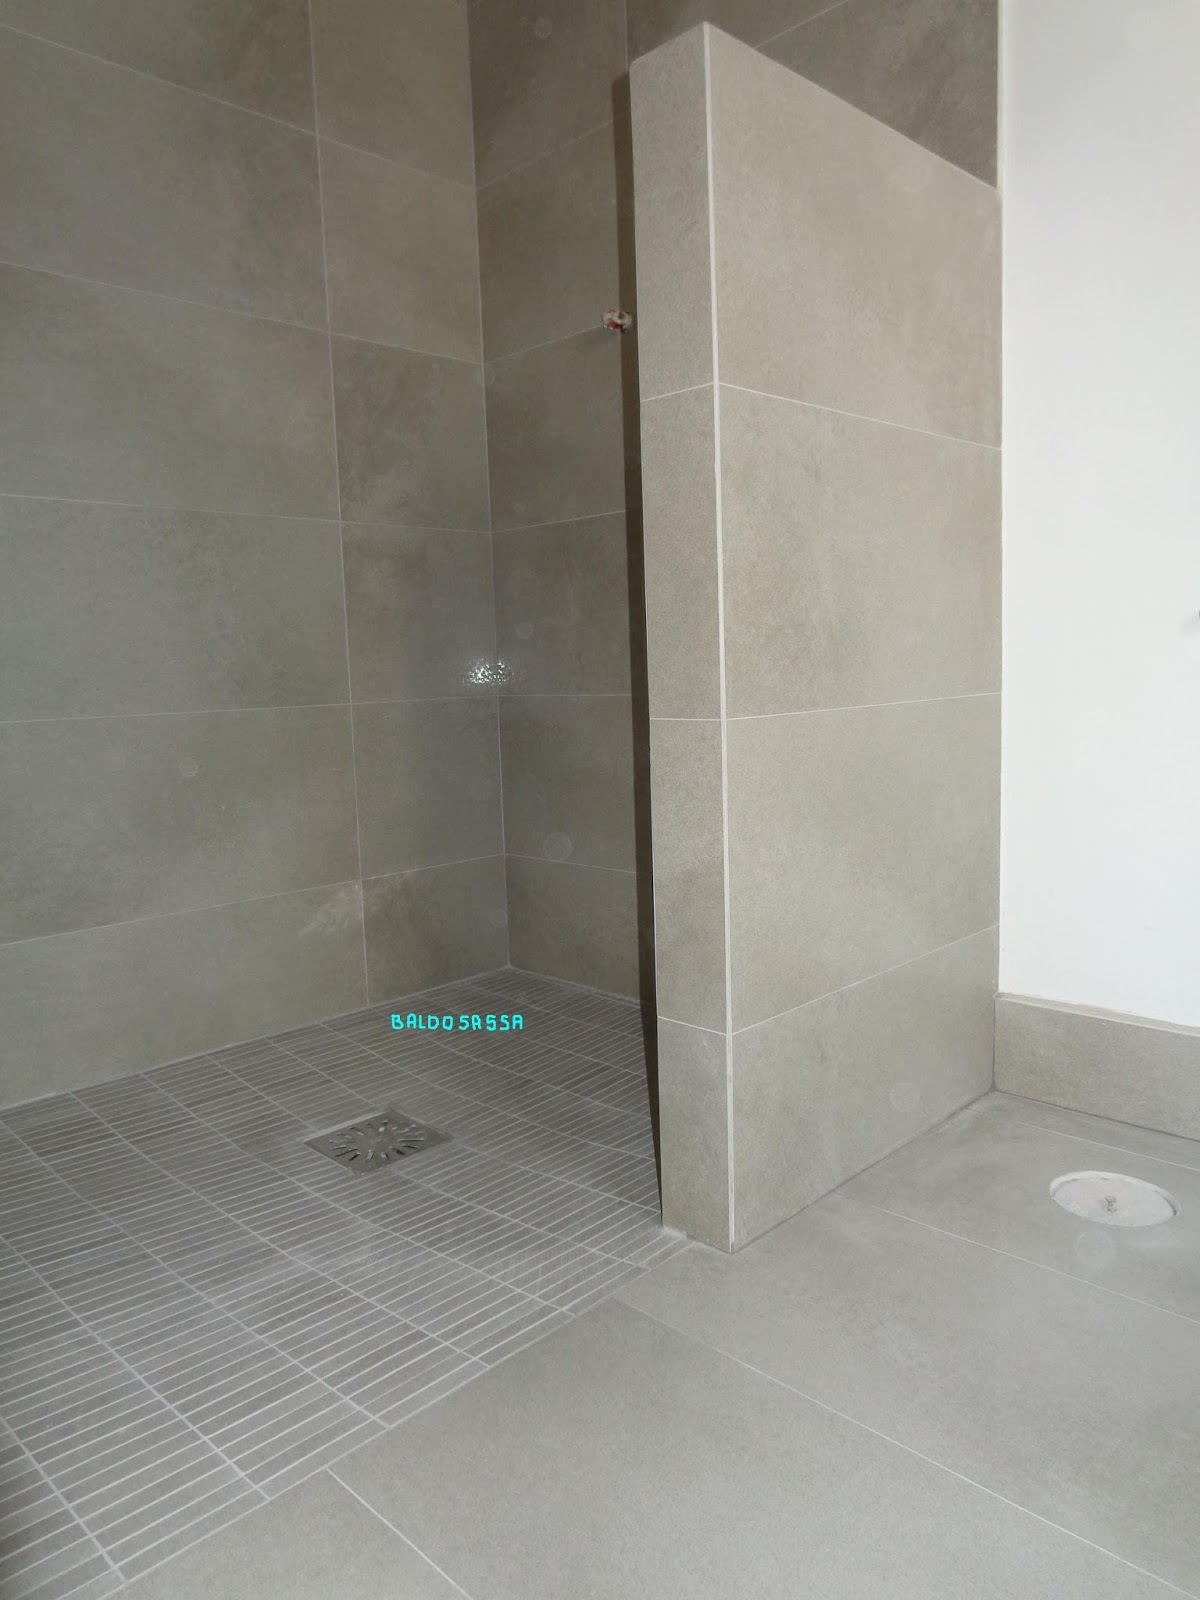 Baldosassa fotos e imagenes de platos de ducha - Plato ducha suelo ...